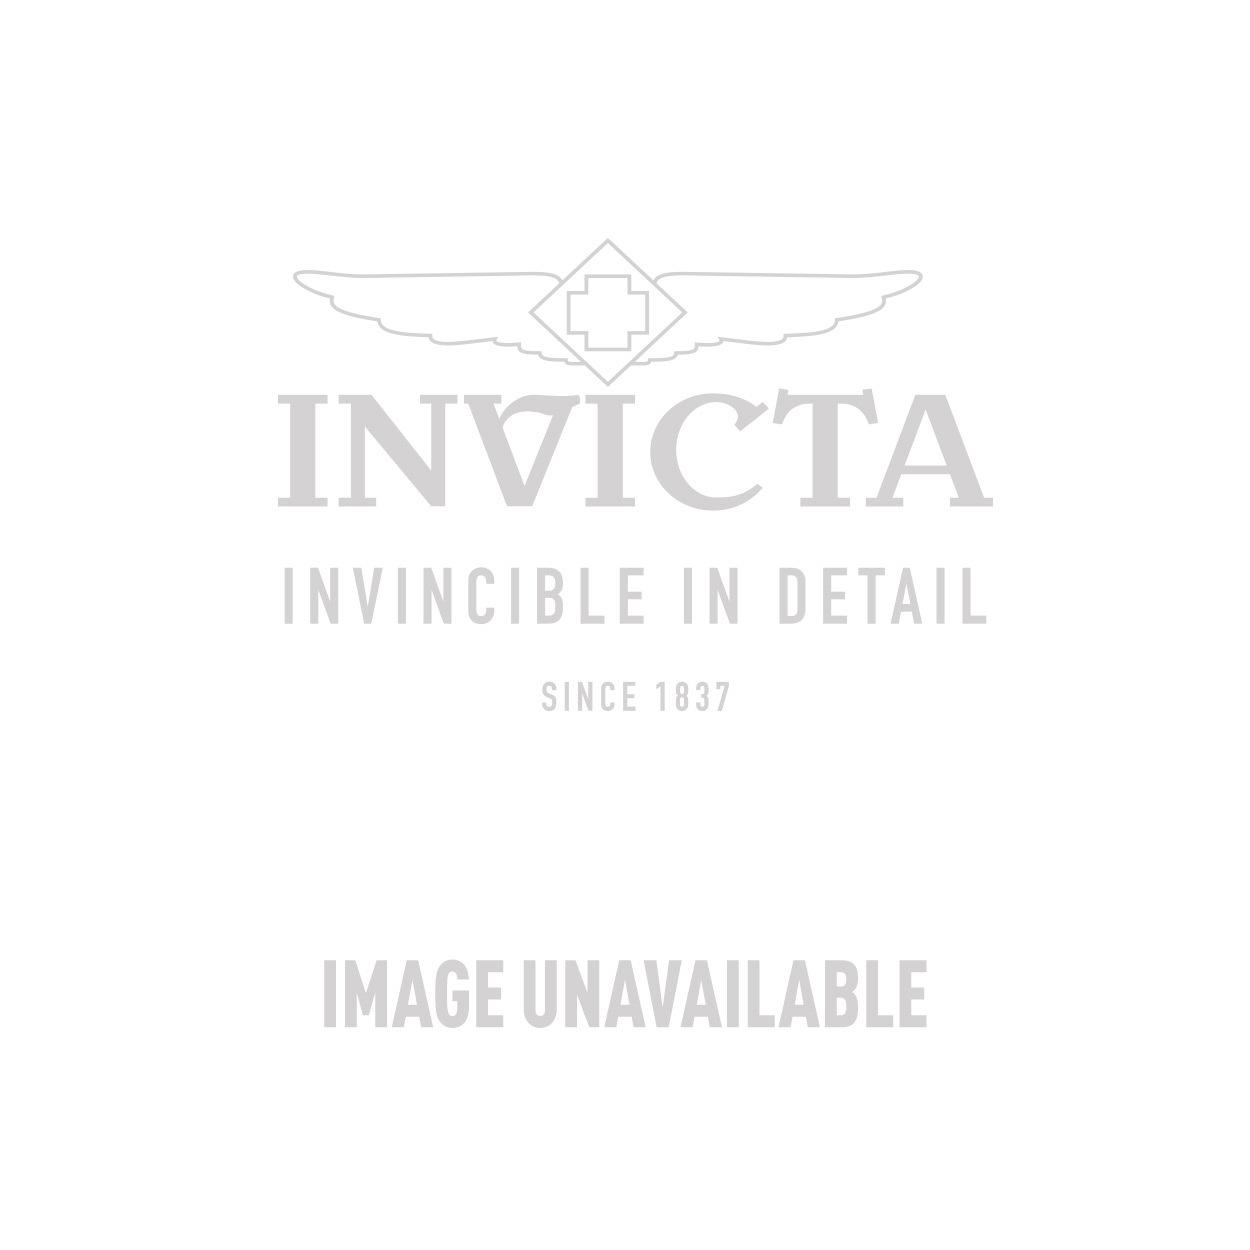 INVICTA Jewelry ALOYSIUS Bracelets 22.5 18 Silver 925 and Ceramic Rhodium+Rose Gold+Platinum - Model J0113